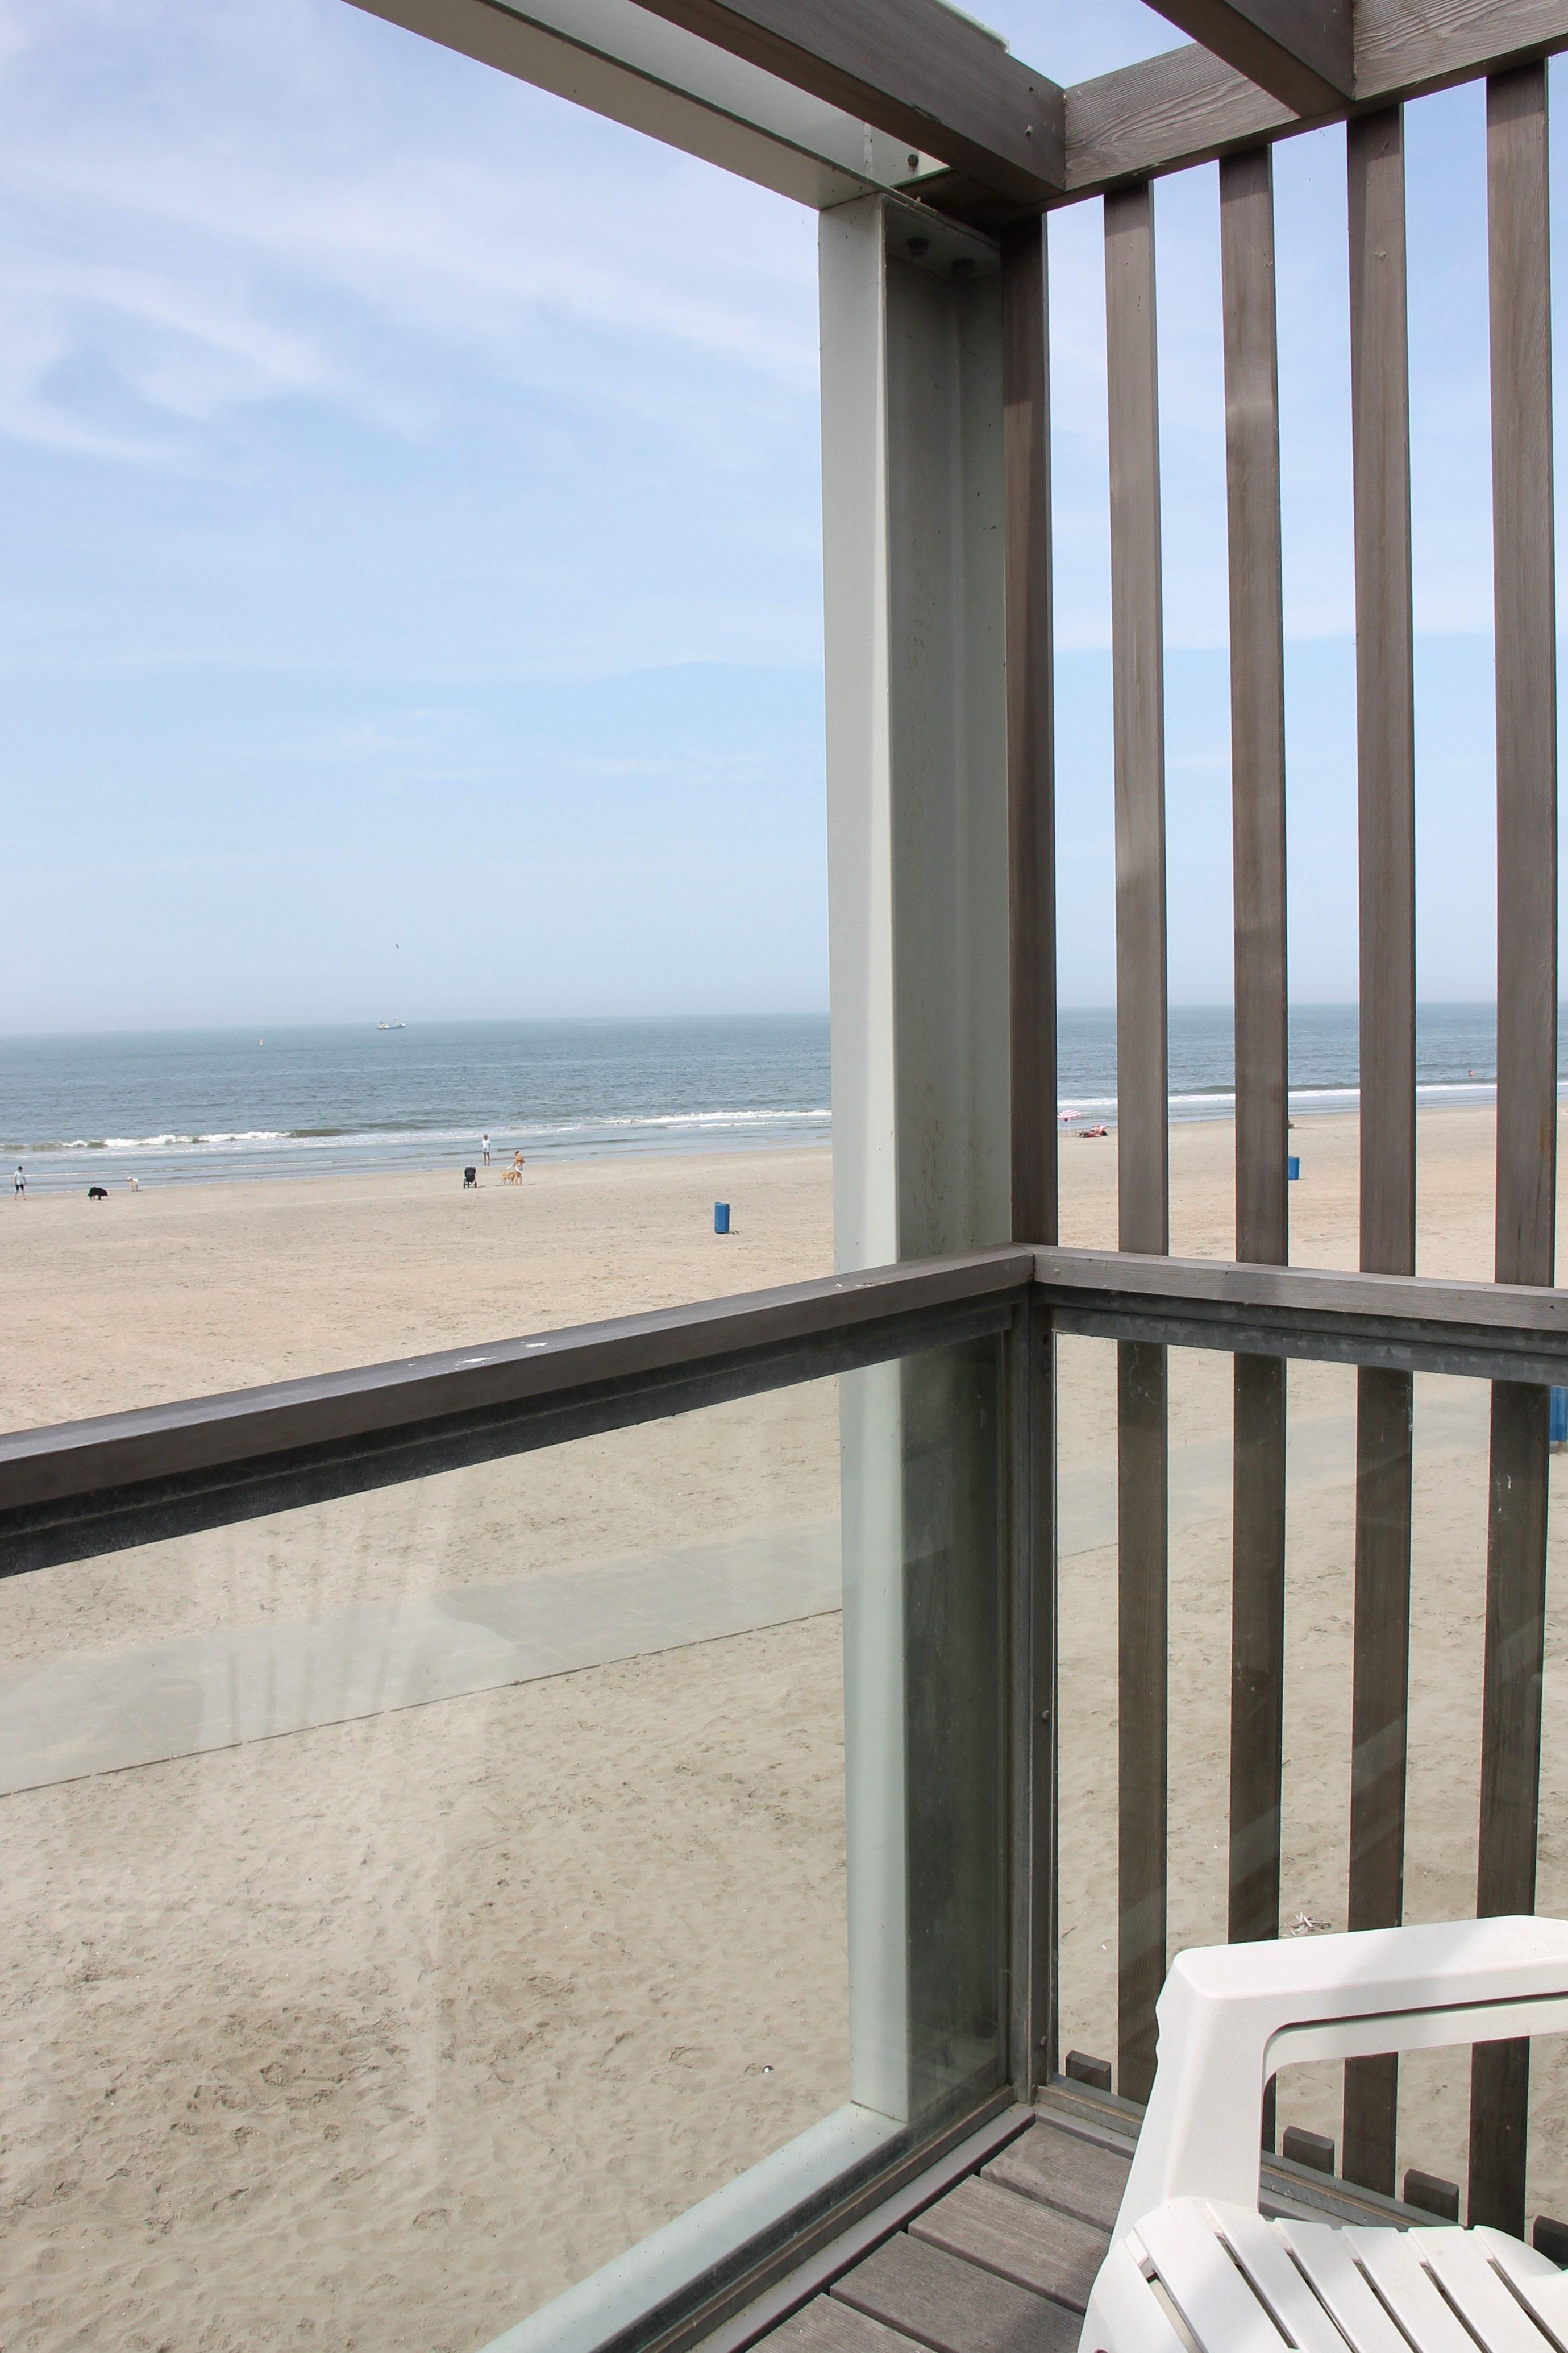 landal beach villas hoek van holland lavendelblog. Black Bedroom Furniture Sets. Home Design Ideas